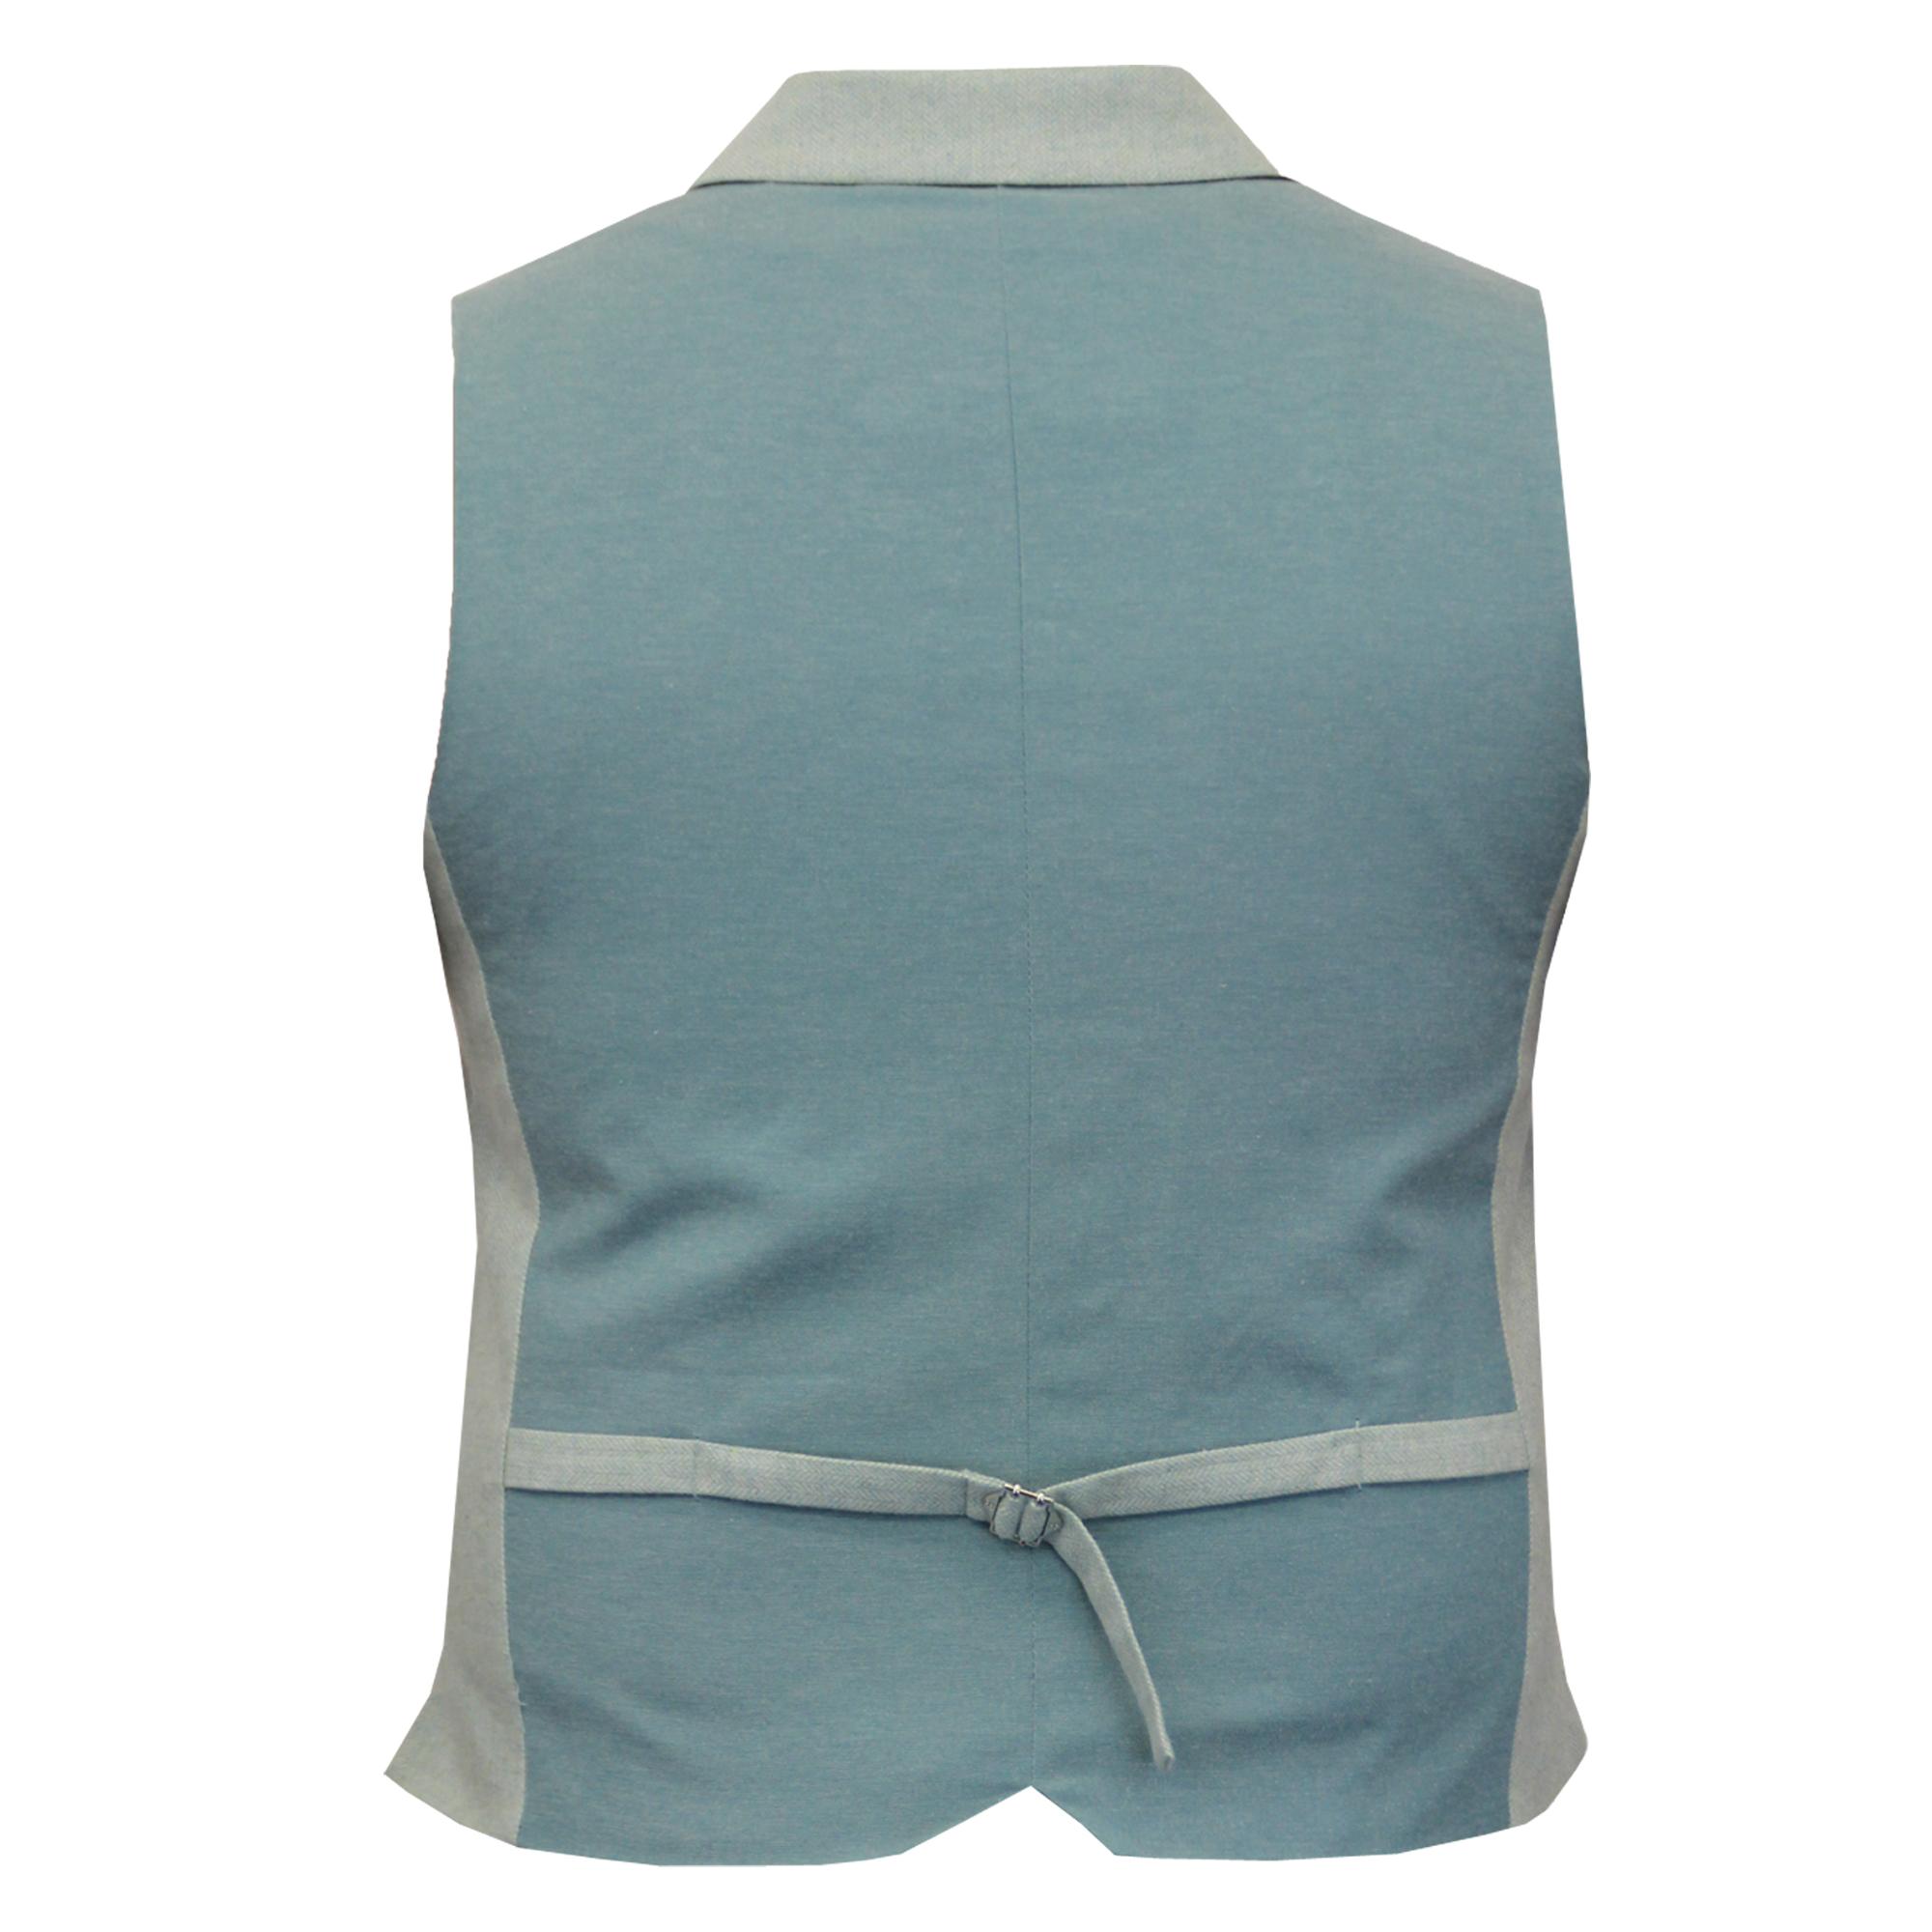 Mens-Waistcoat-Wool-Mix-Cavani-Formal-Vest-Herringbone-Tweed-Check-Party-Smart thumbnail 3